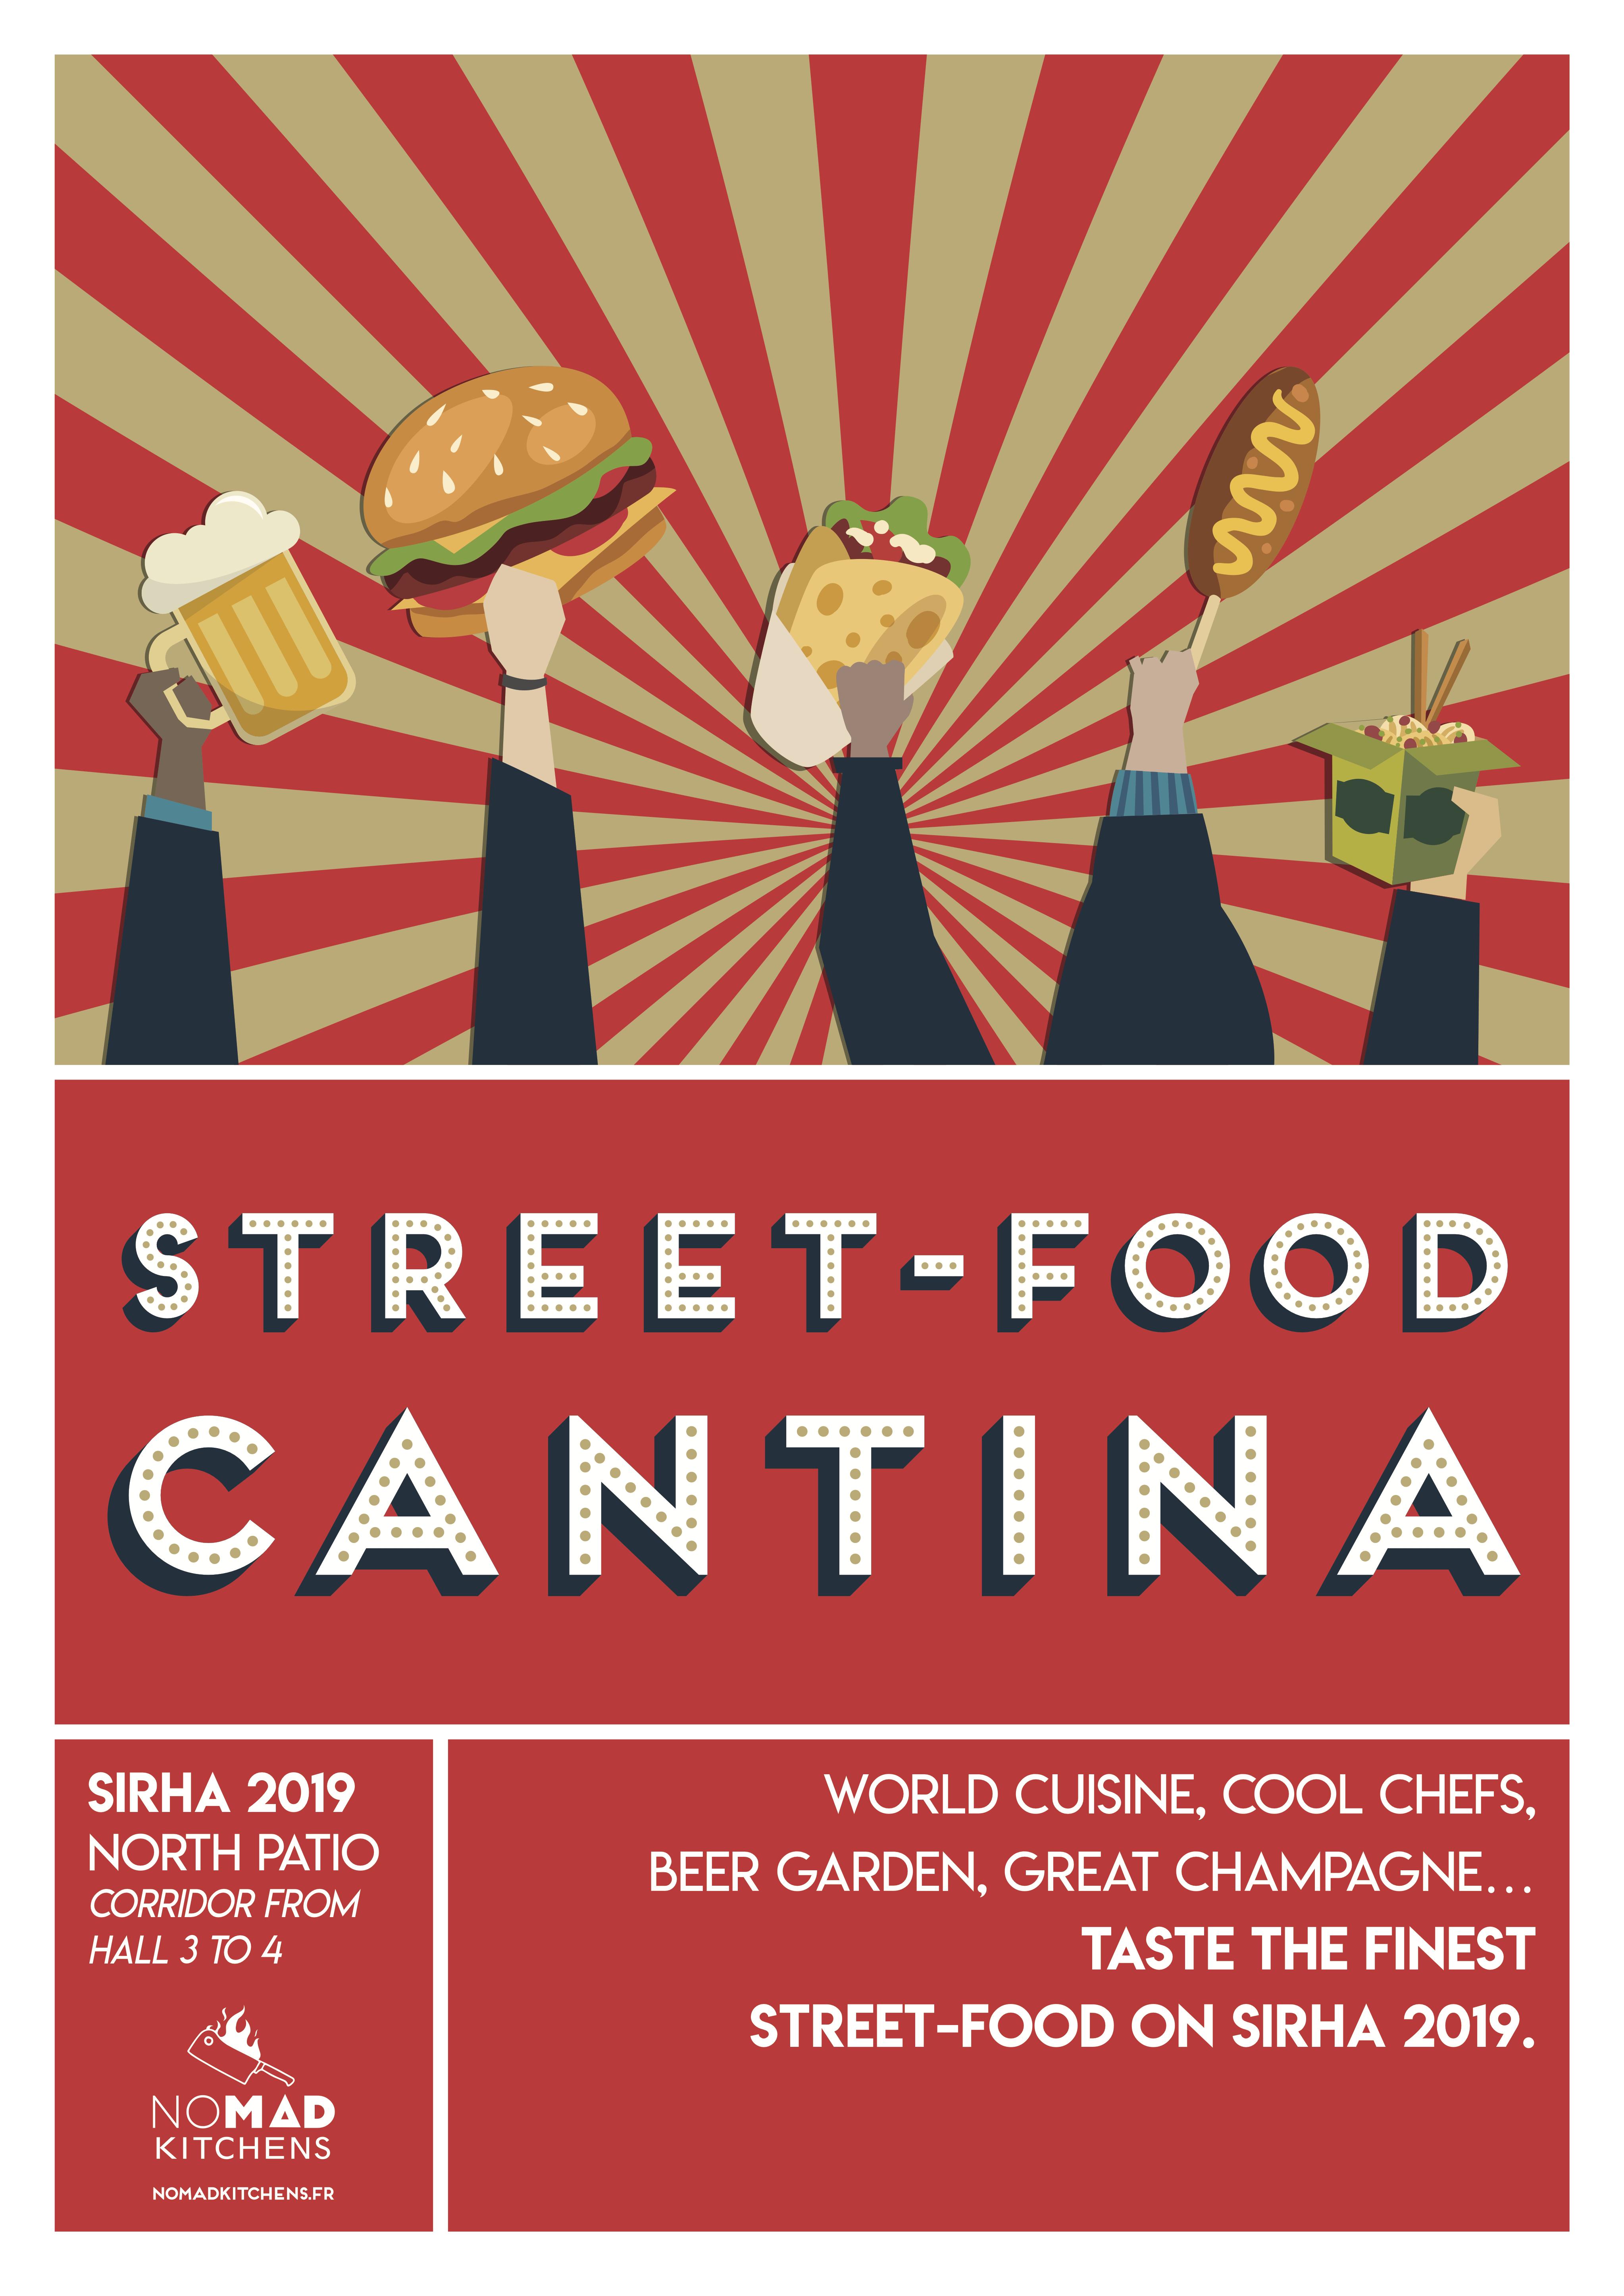 Bistro Zakka - Sirha - Street food cantina - Nomad Kitchen - Food Trucks Gourmet